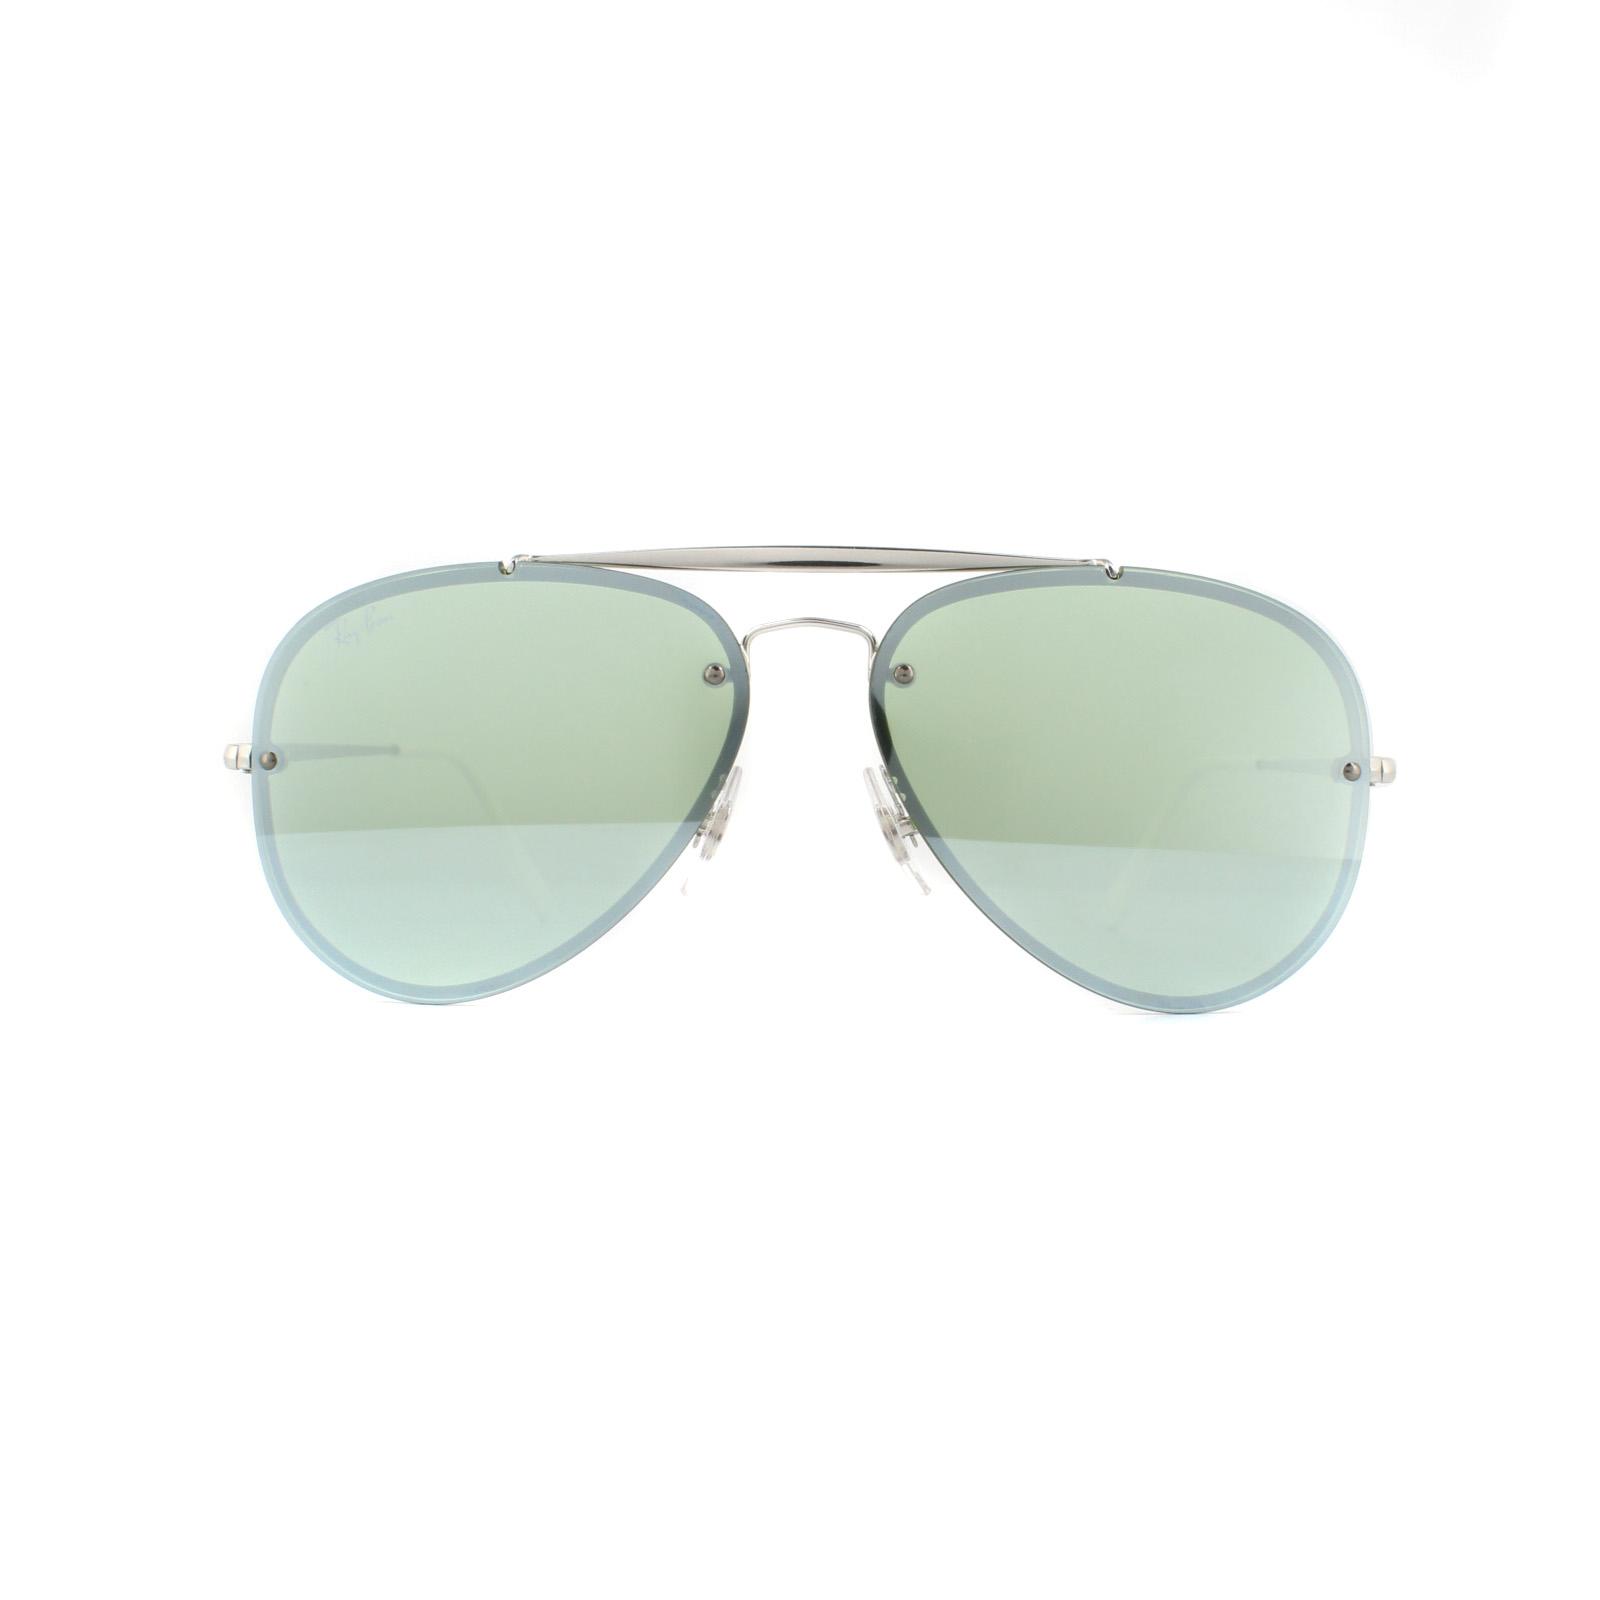 e31ef365c7 Sentinel Ray-Ban Sunglasses Blaze Aviator 3584N 905130 Silver Dark Green  Silver Mirror